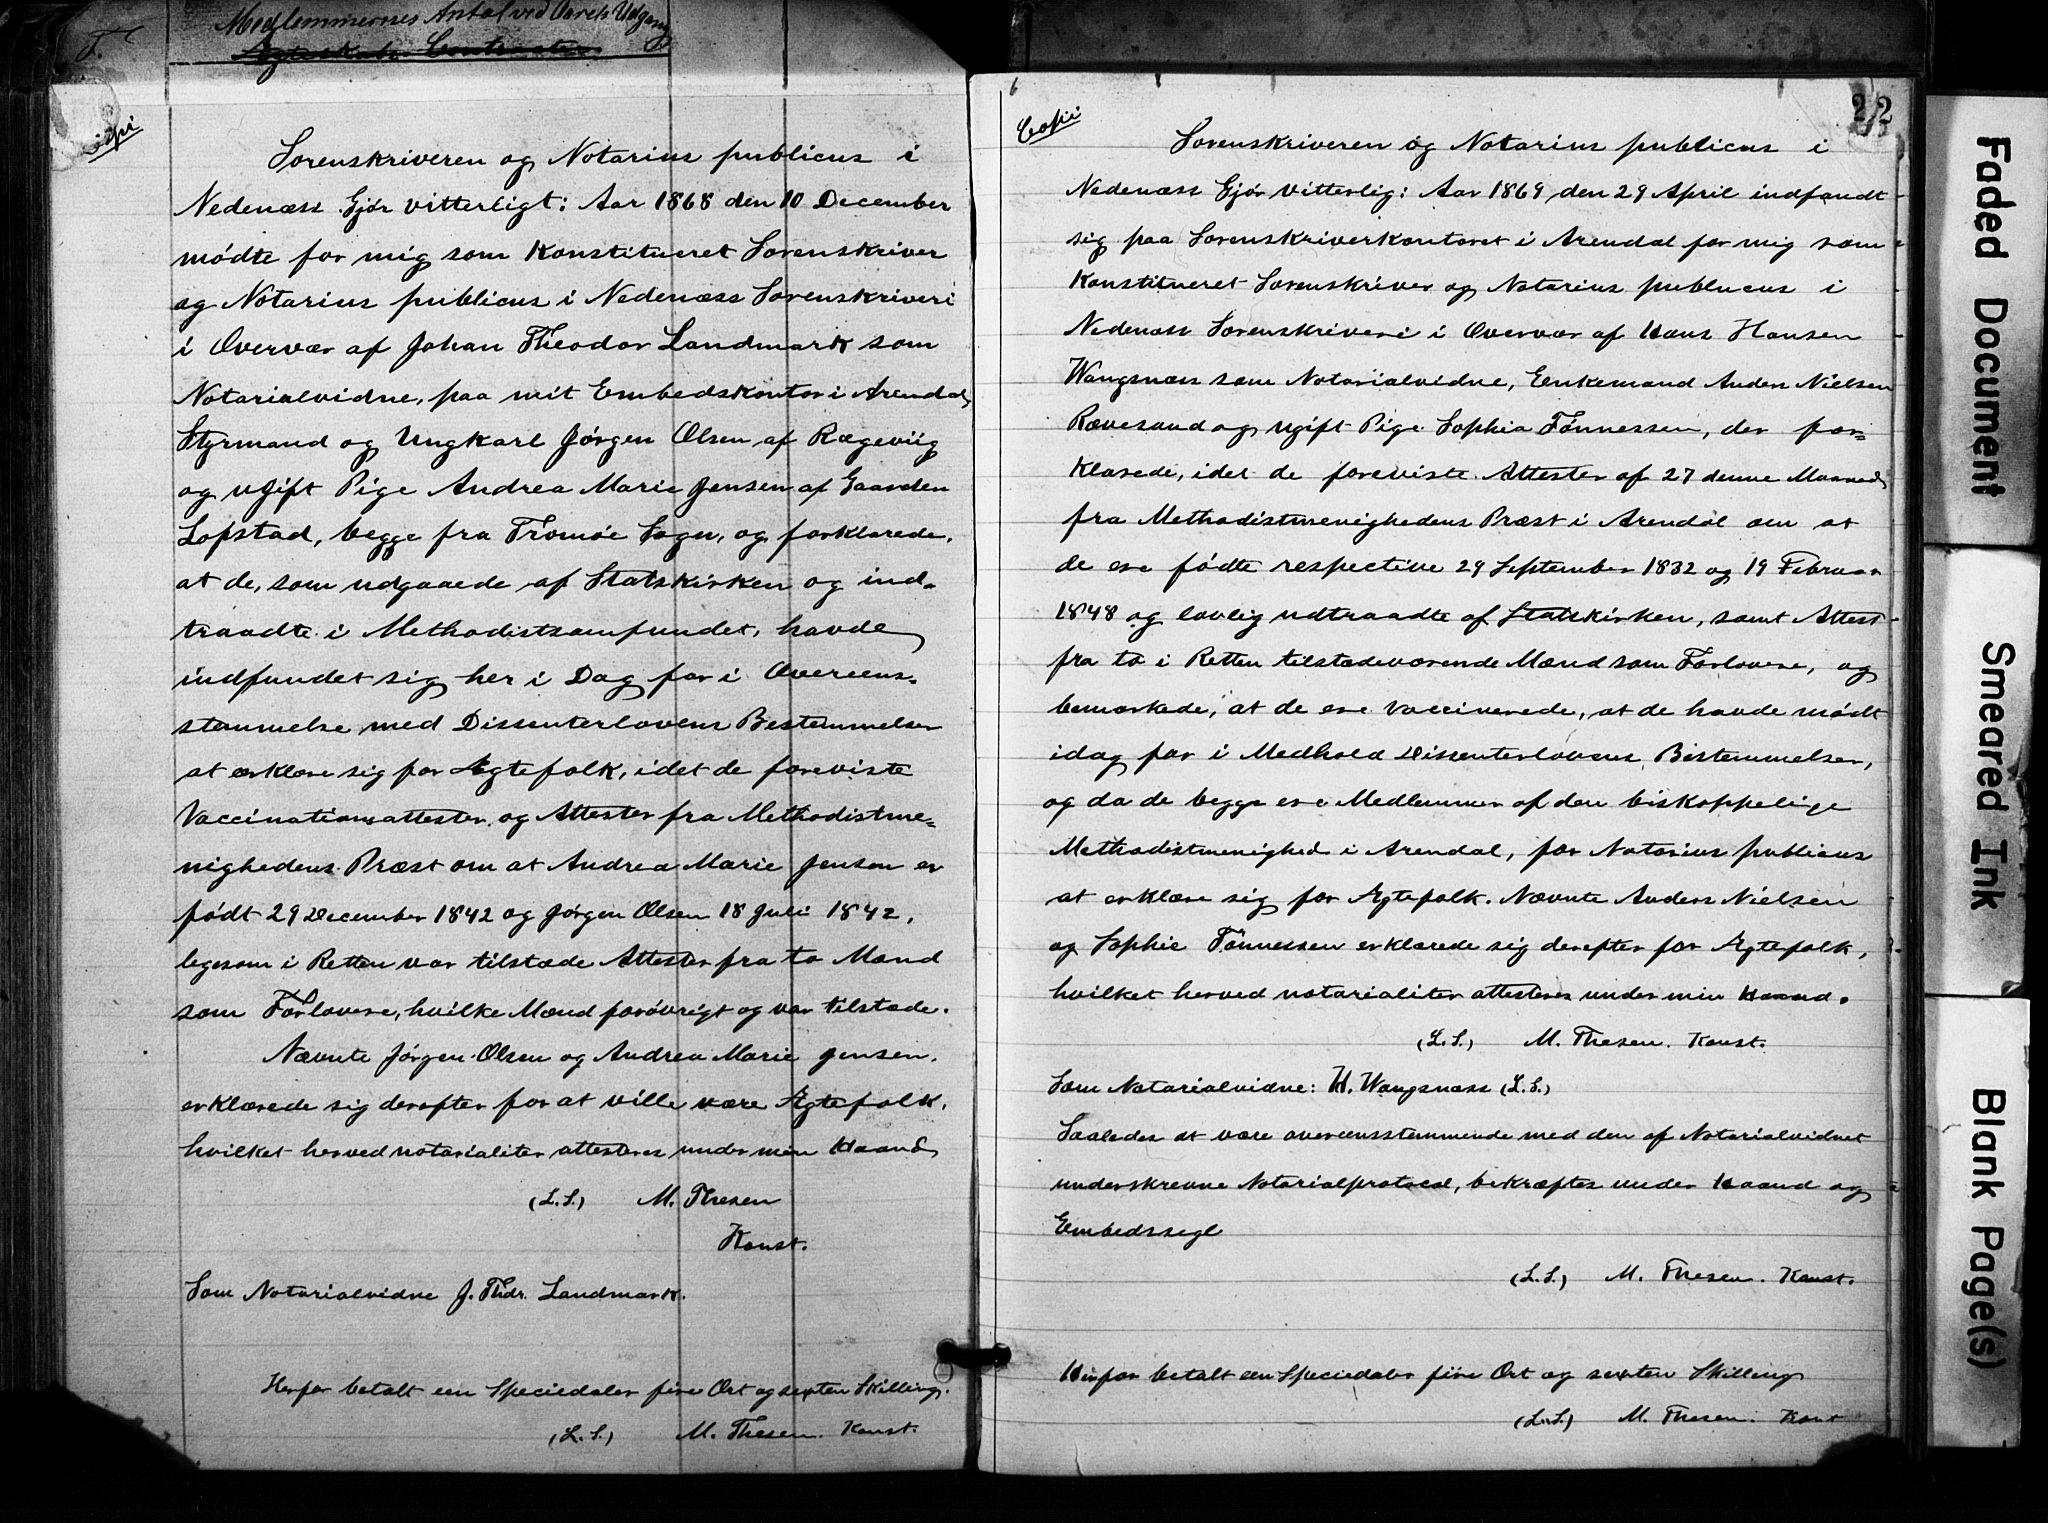 SAK, Metodistmenigheten, Arendal, F/Fa/L0001: Dissenterprotokoll nr. F-2, 1867-1879, s. 240